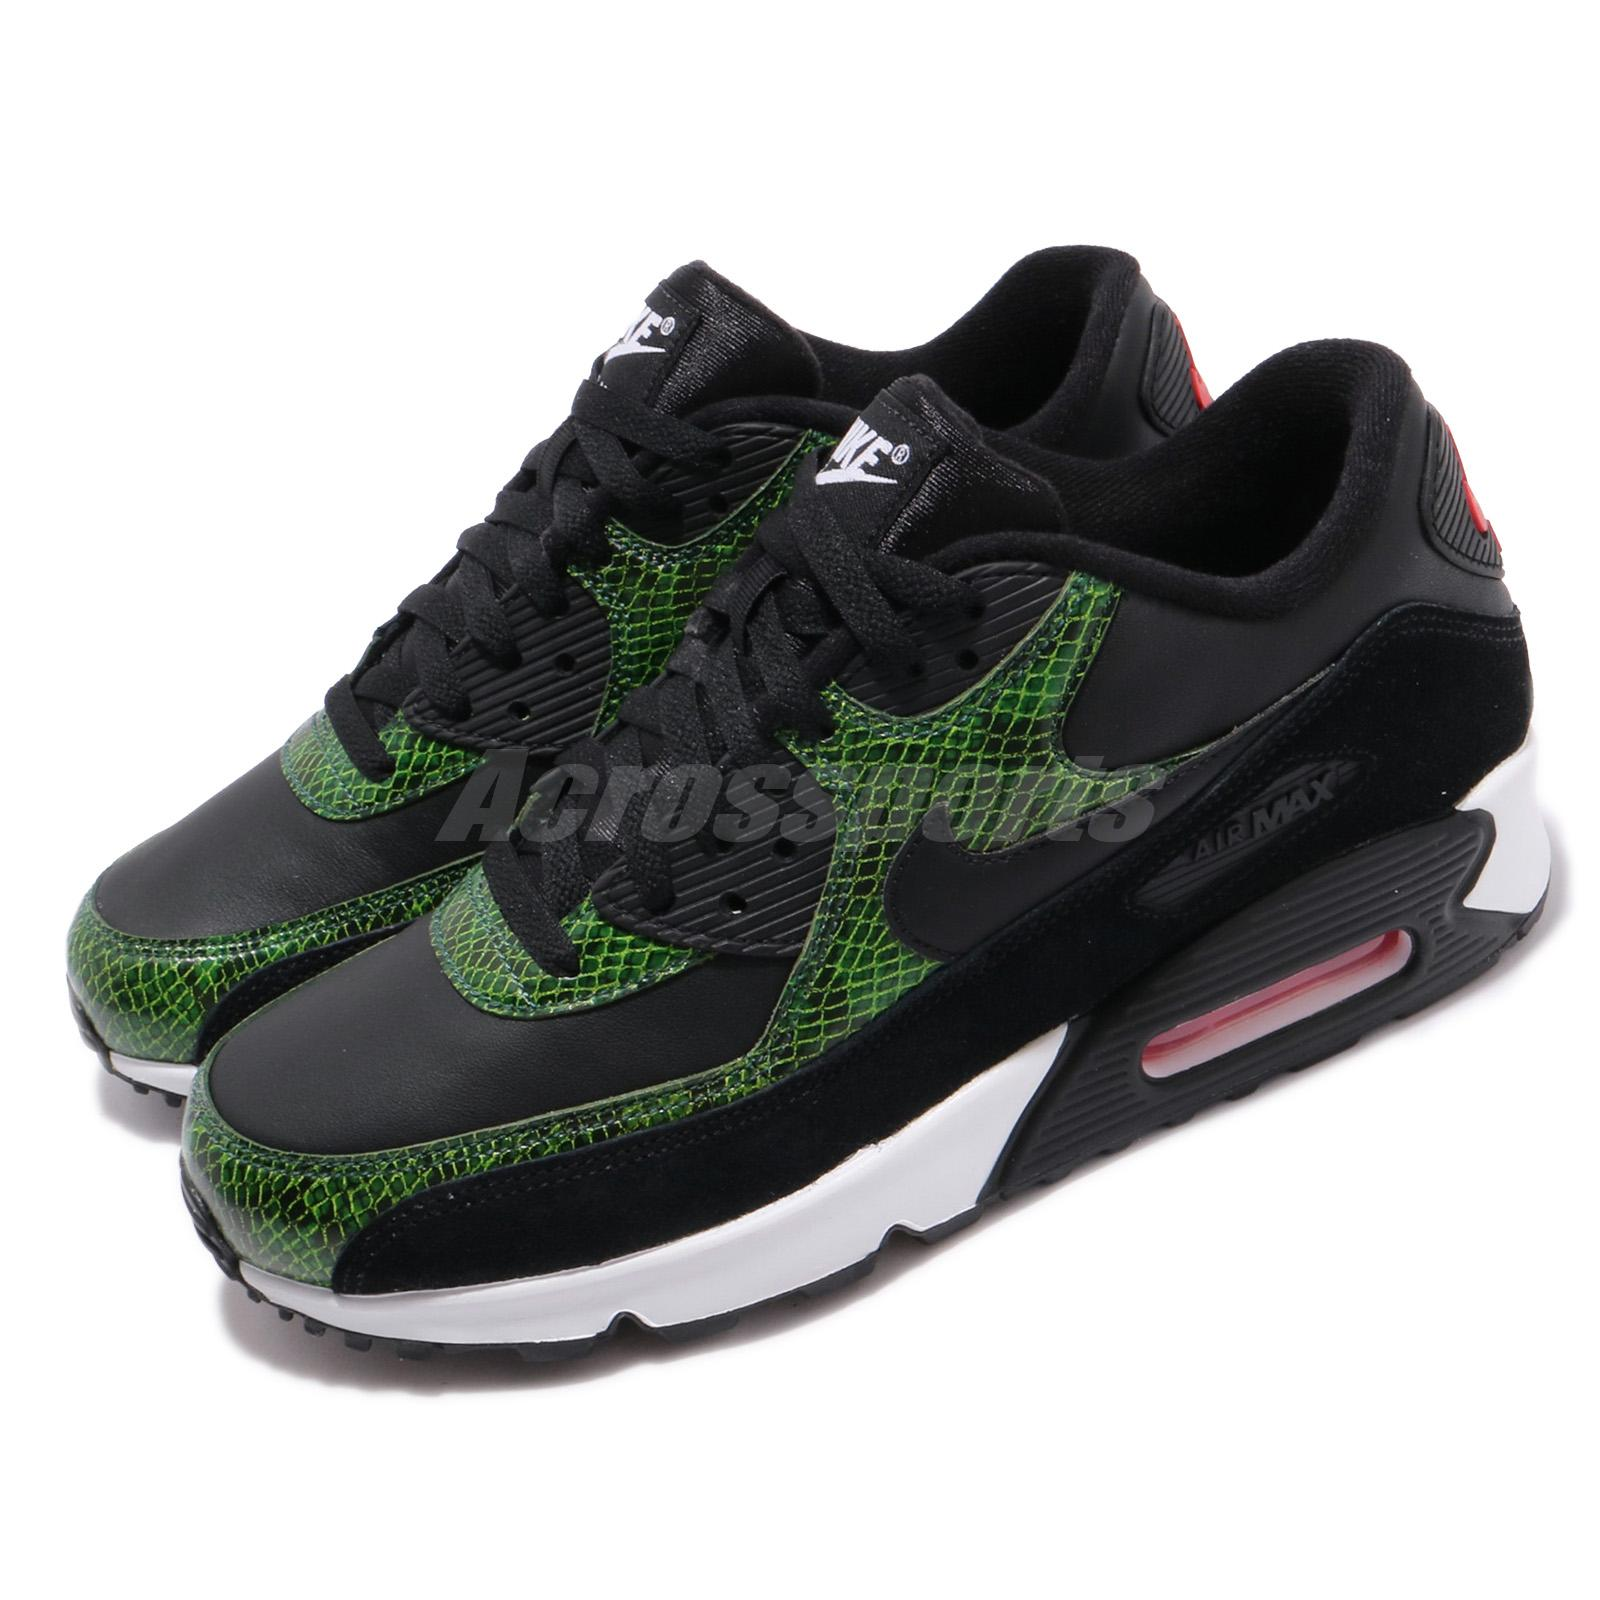 | CD0916 001 Nike Air Max 90 Green Python Black